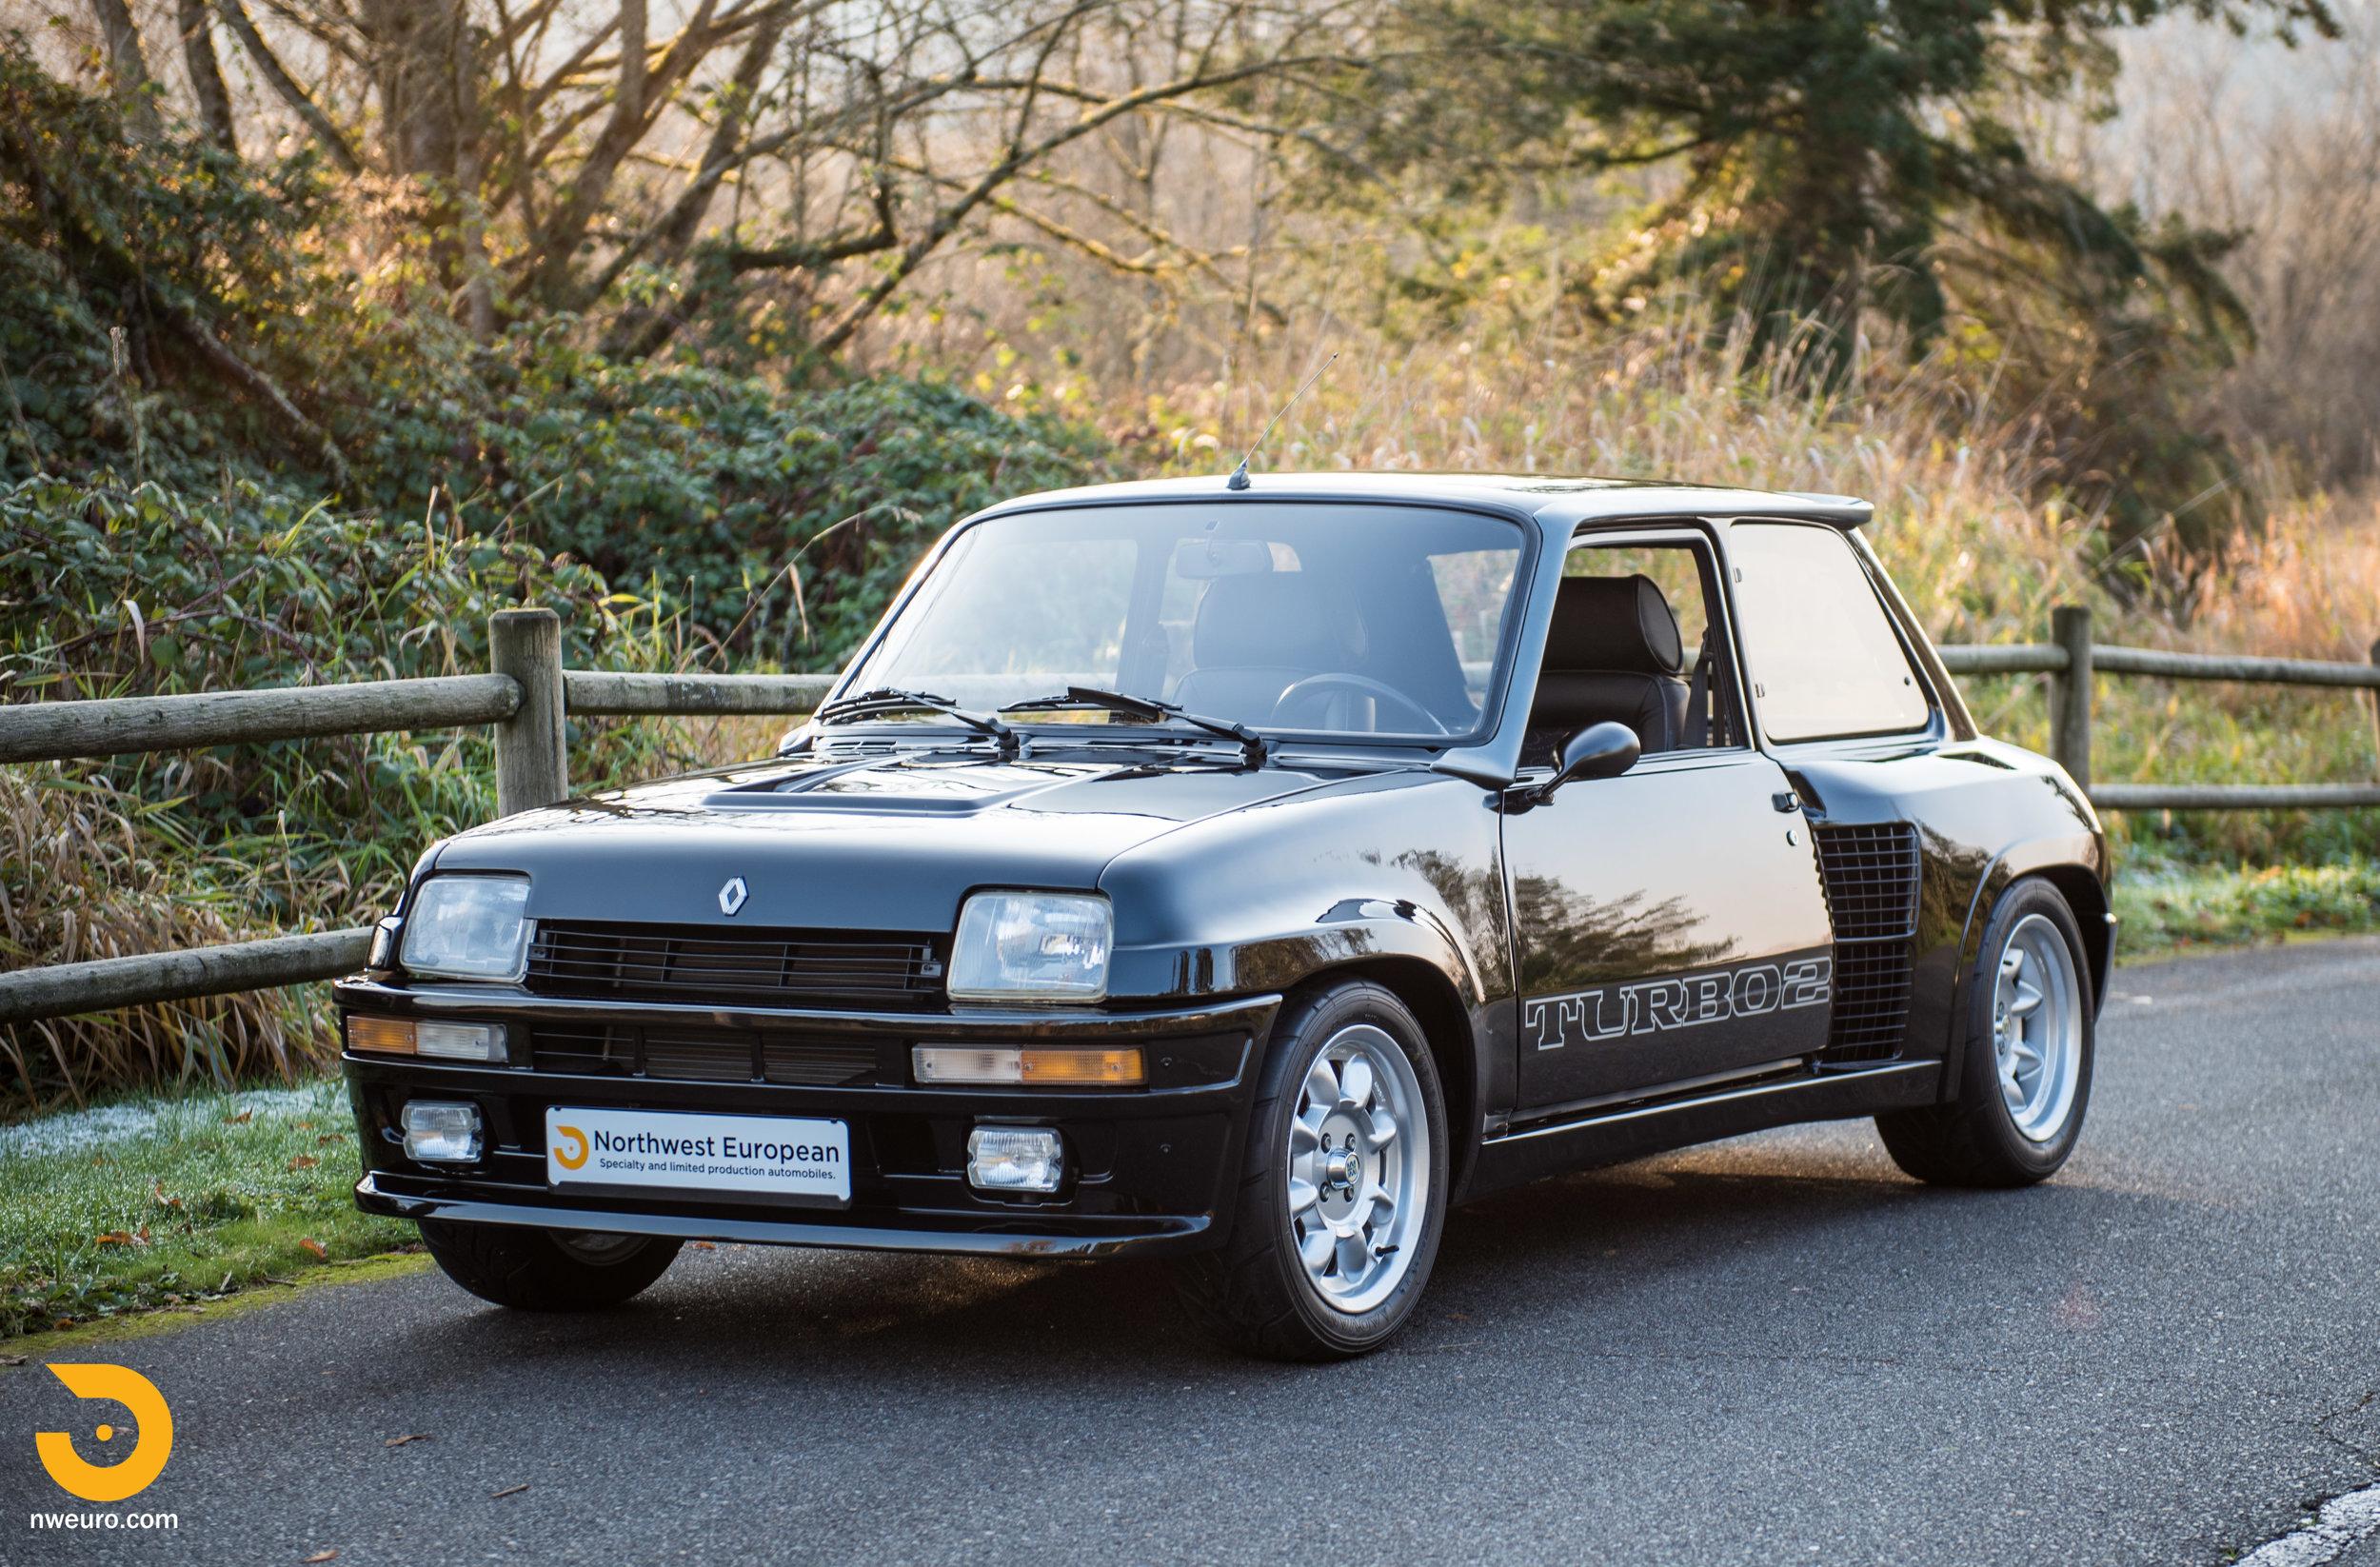 1983 Renault R5 Turbo 2 Black at Park-8.jpg